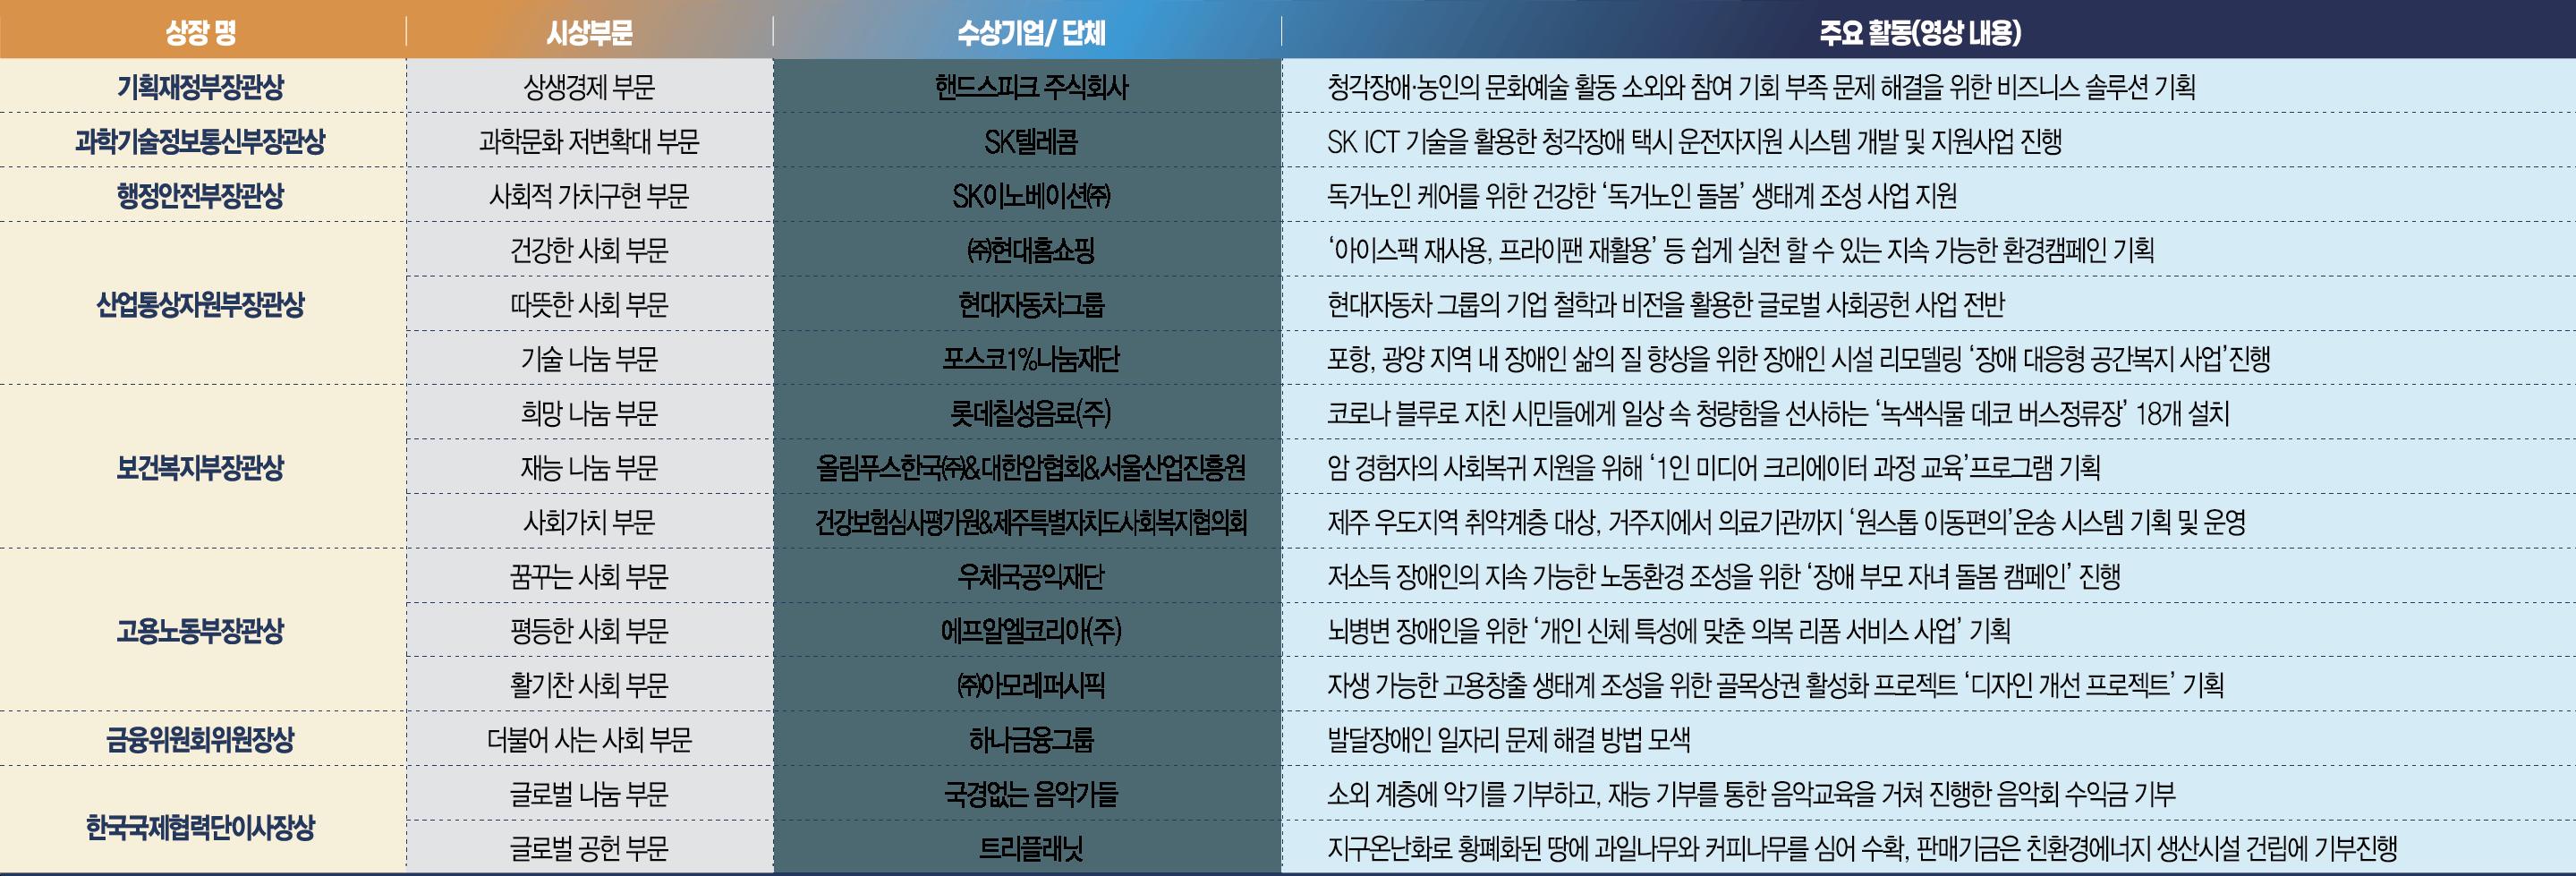 mb-file.php?path=2020%2F12%2F02%2FF15_Asset%202%404x-8.png